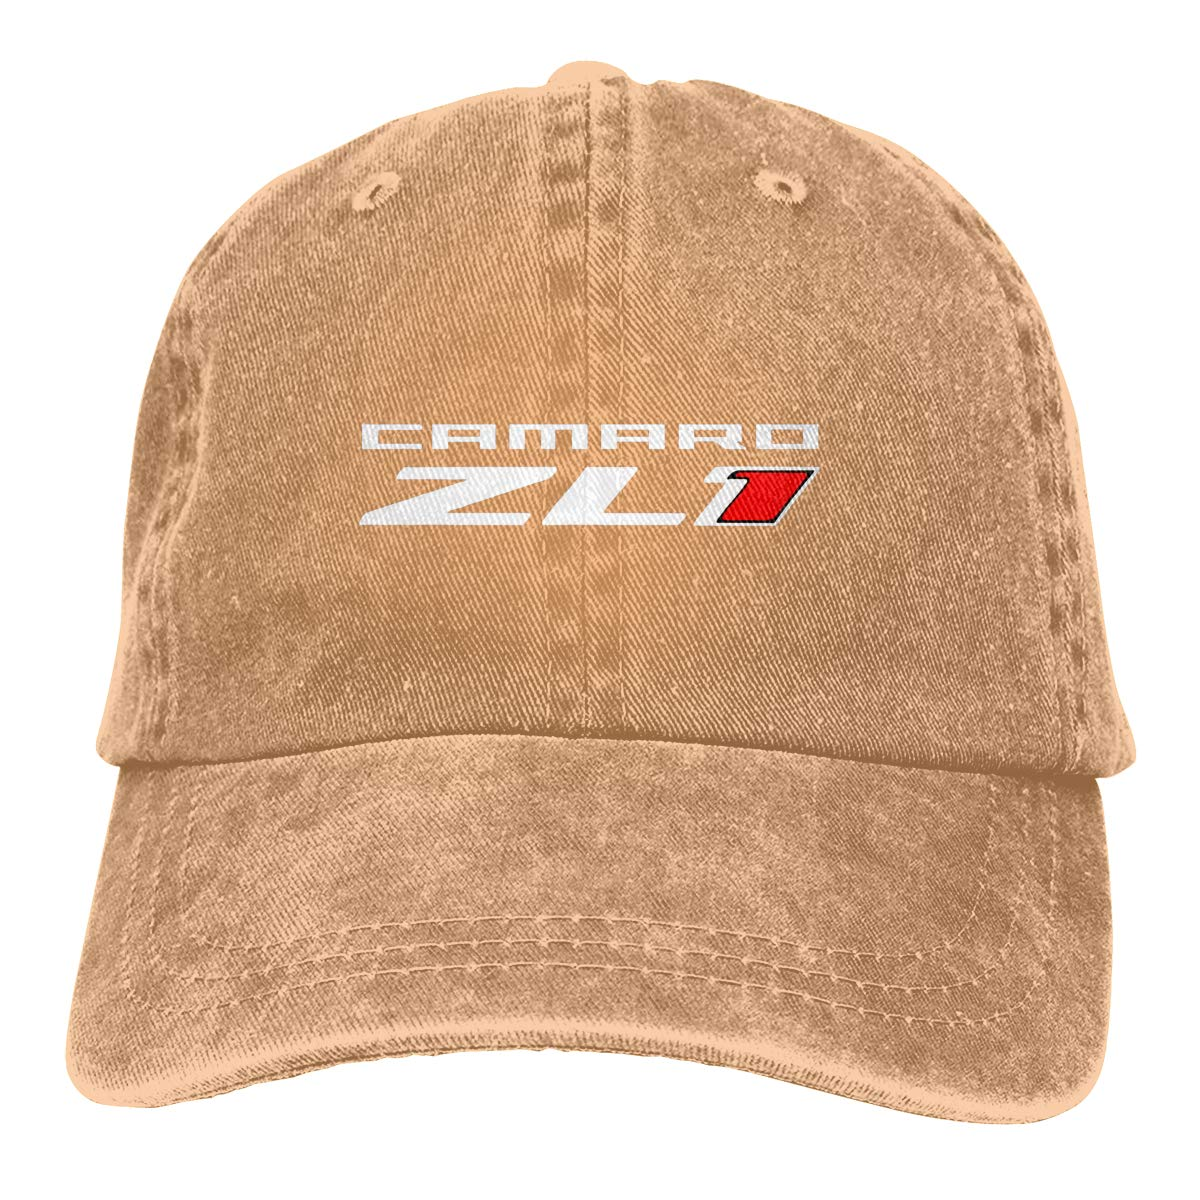 Eugrandet Camaro ZL1 Unisex Baseball Cap Twill Adjustable Hat